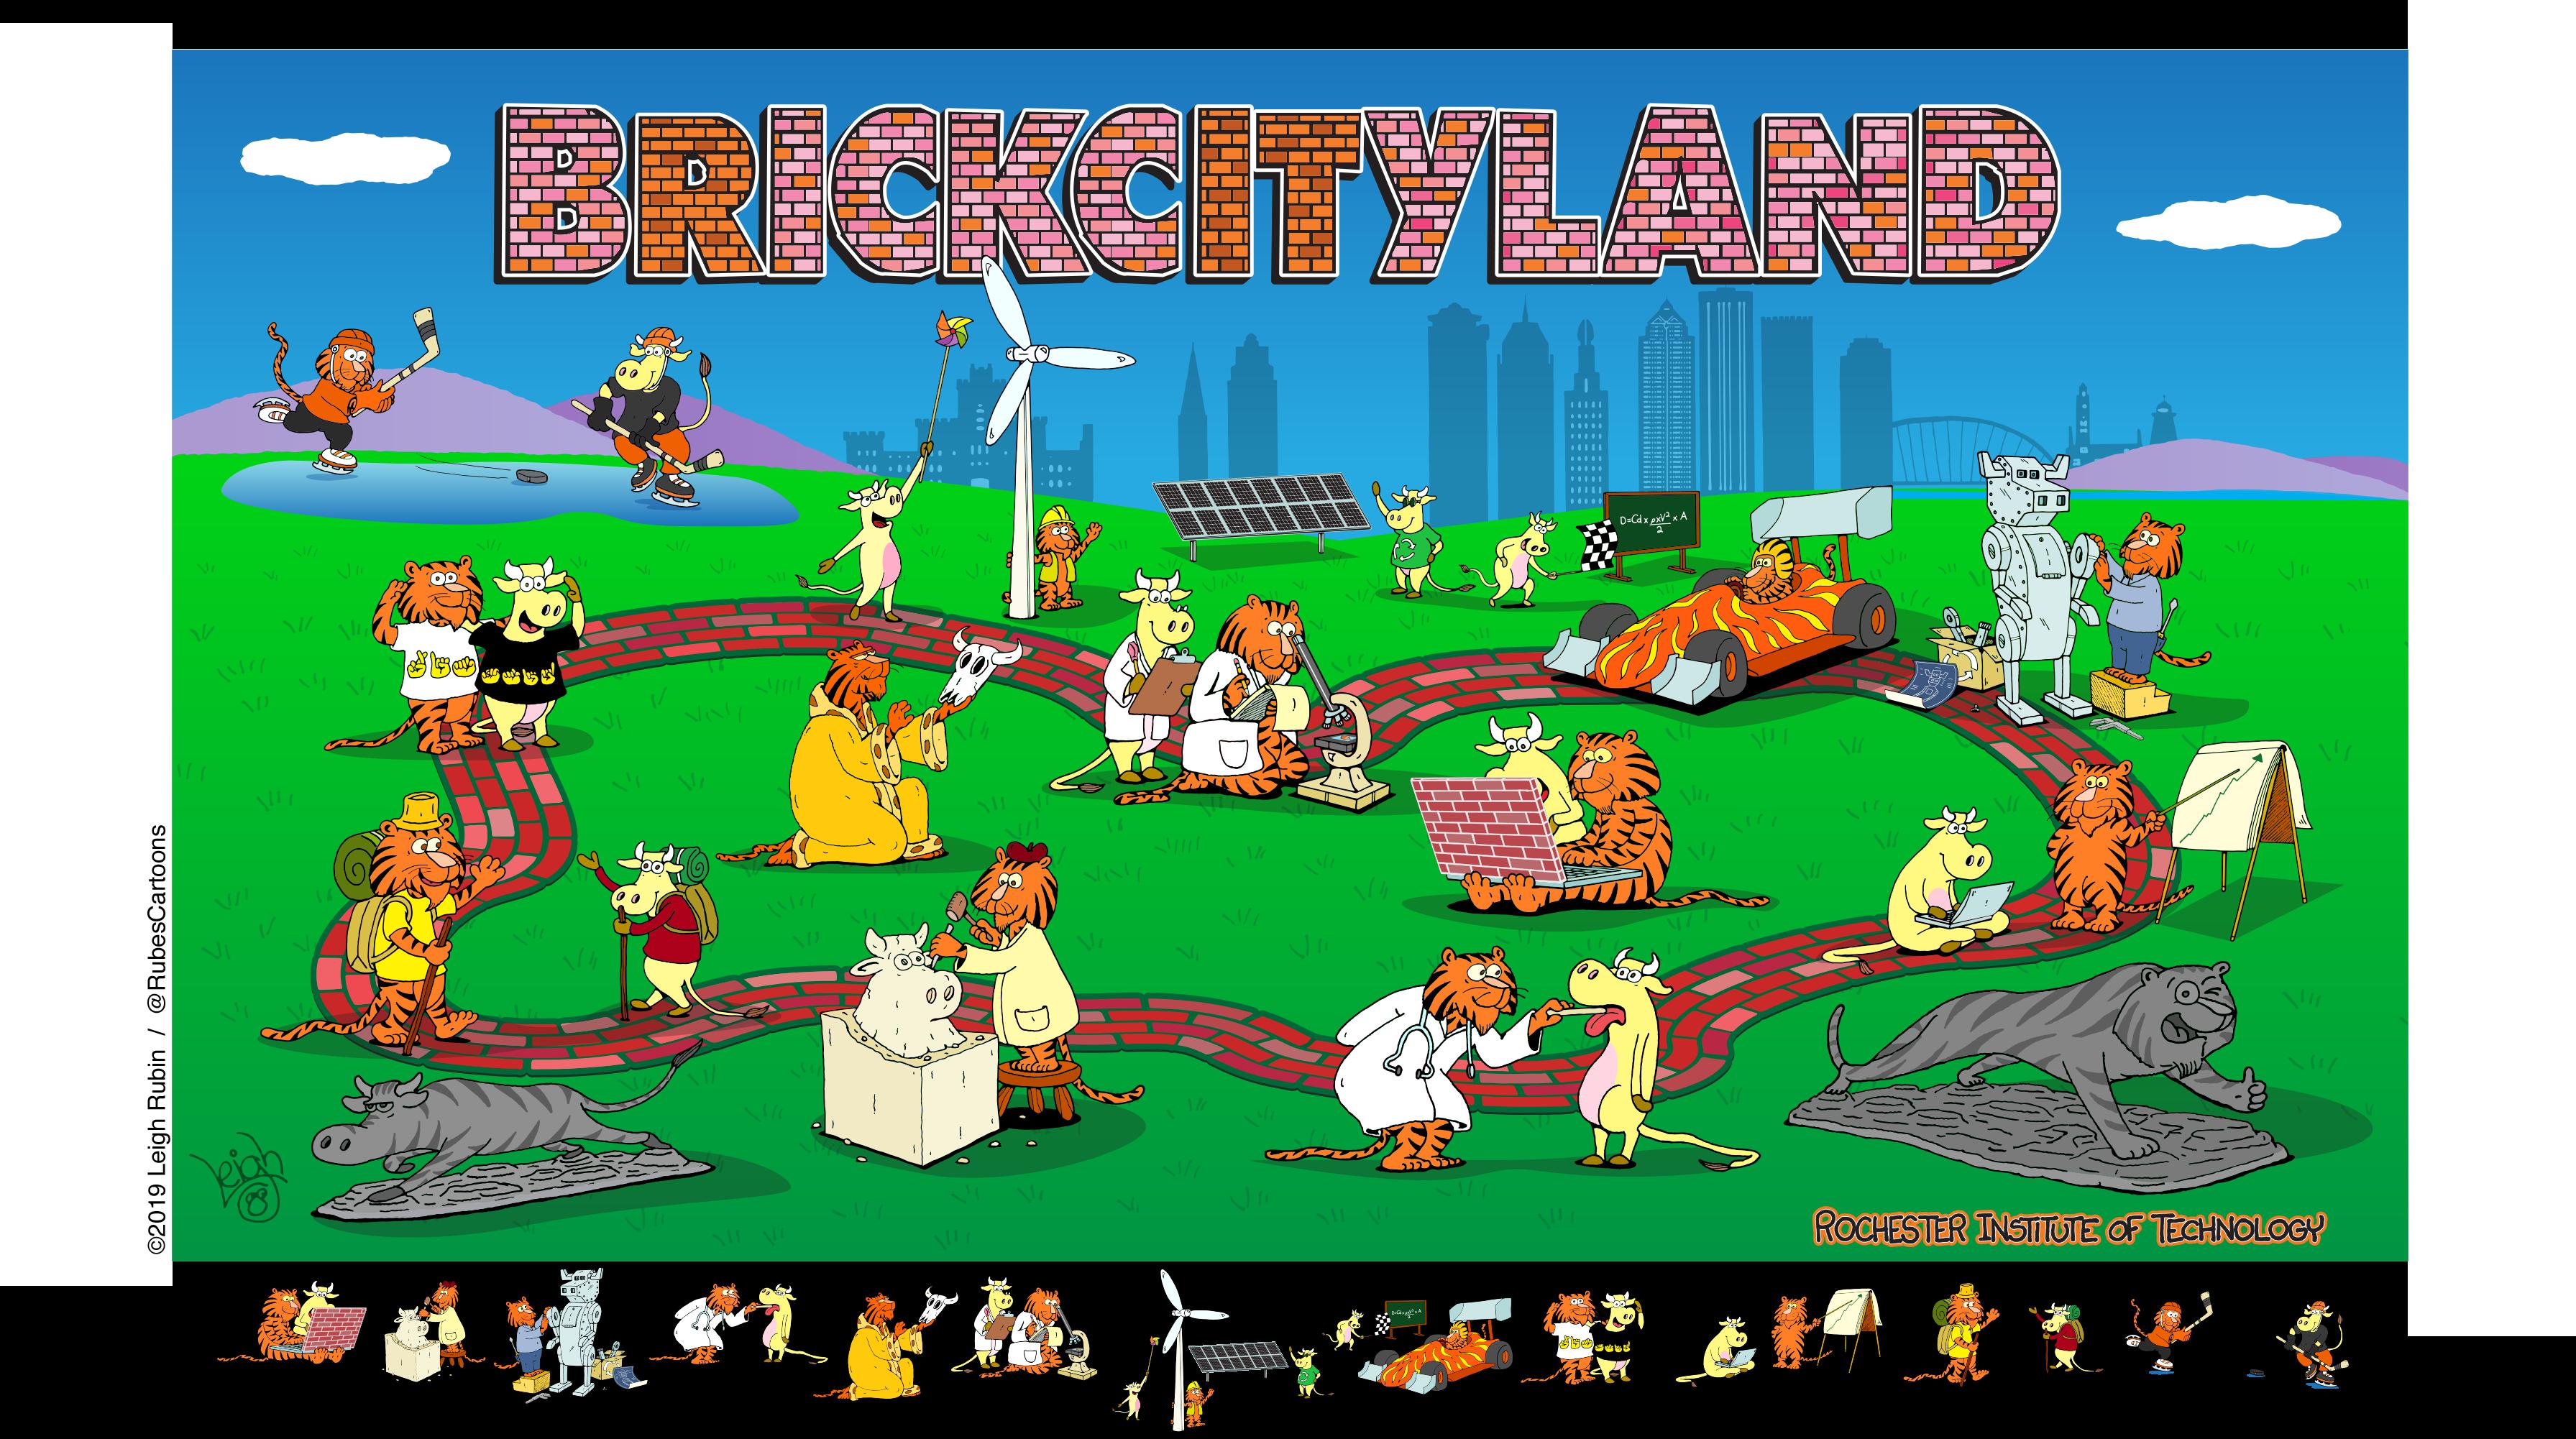 BrickCityLand